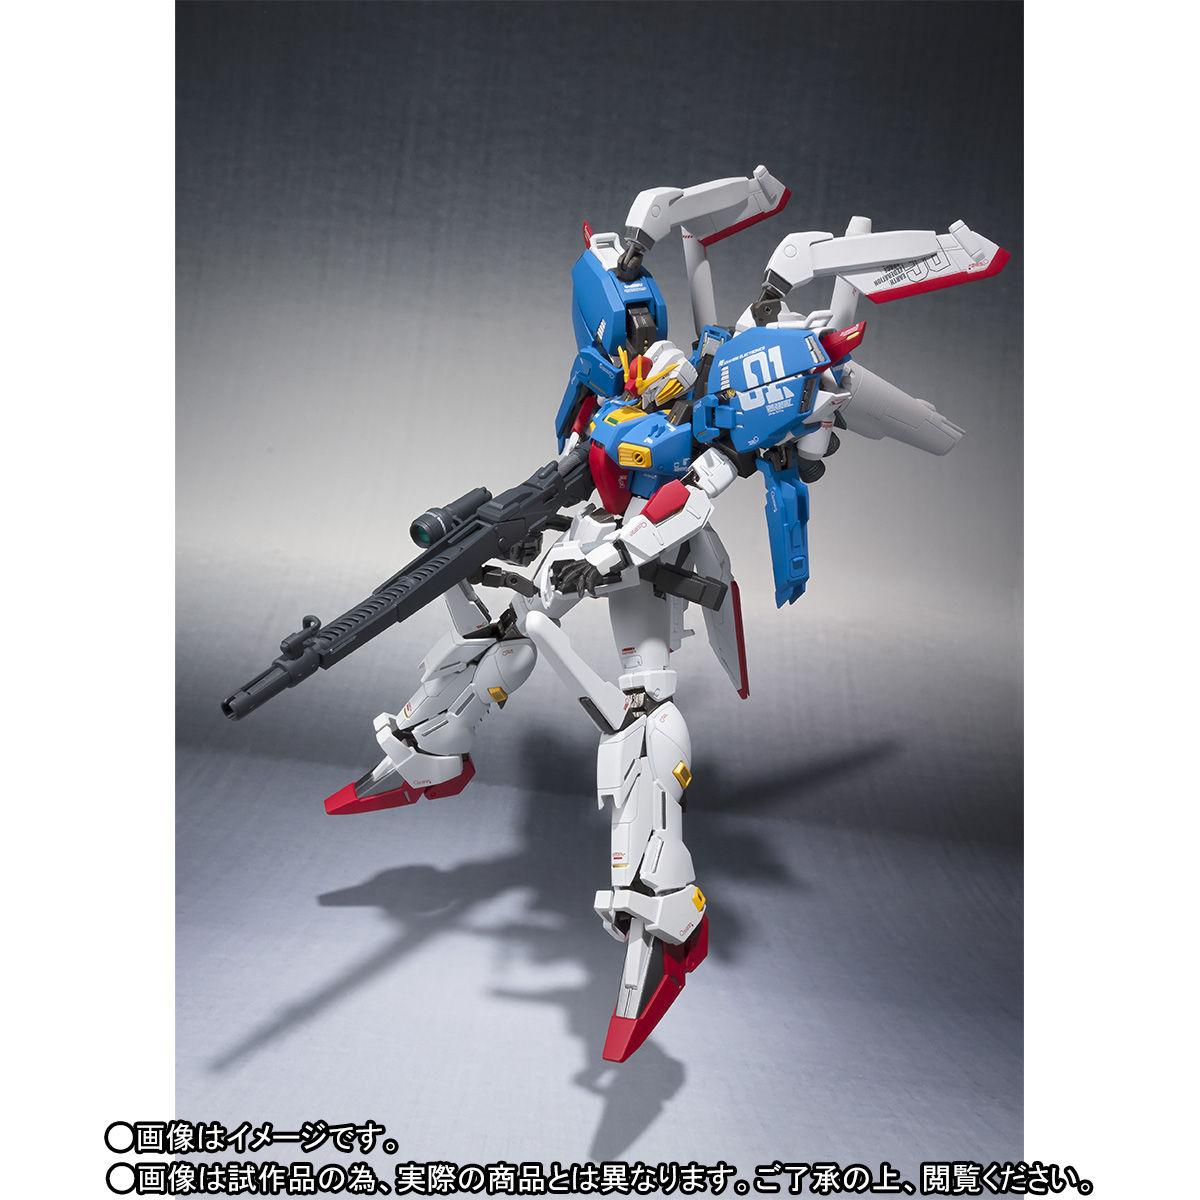 METAL ROBOT魂(Ka signature)〈SIDE MS〉『Sガンダム』可動フィギュア-004